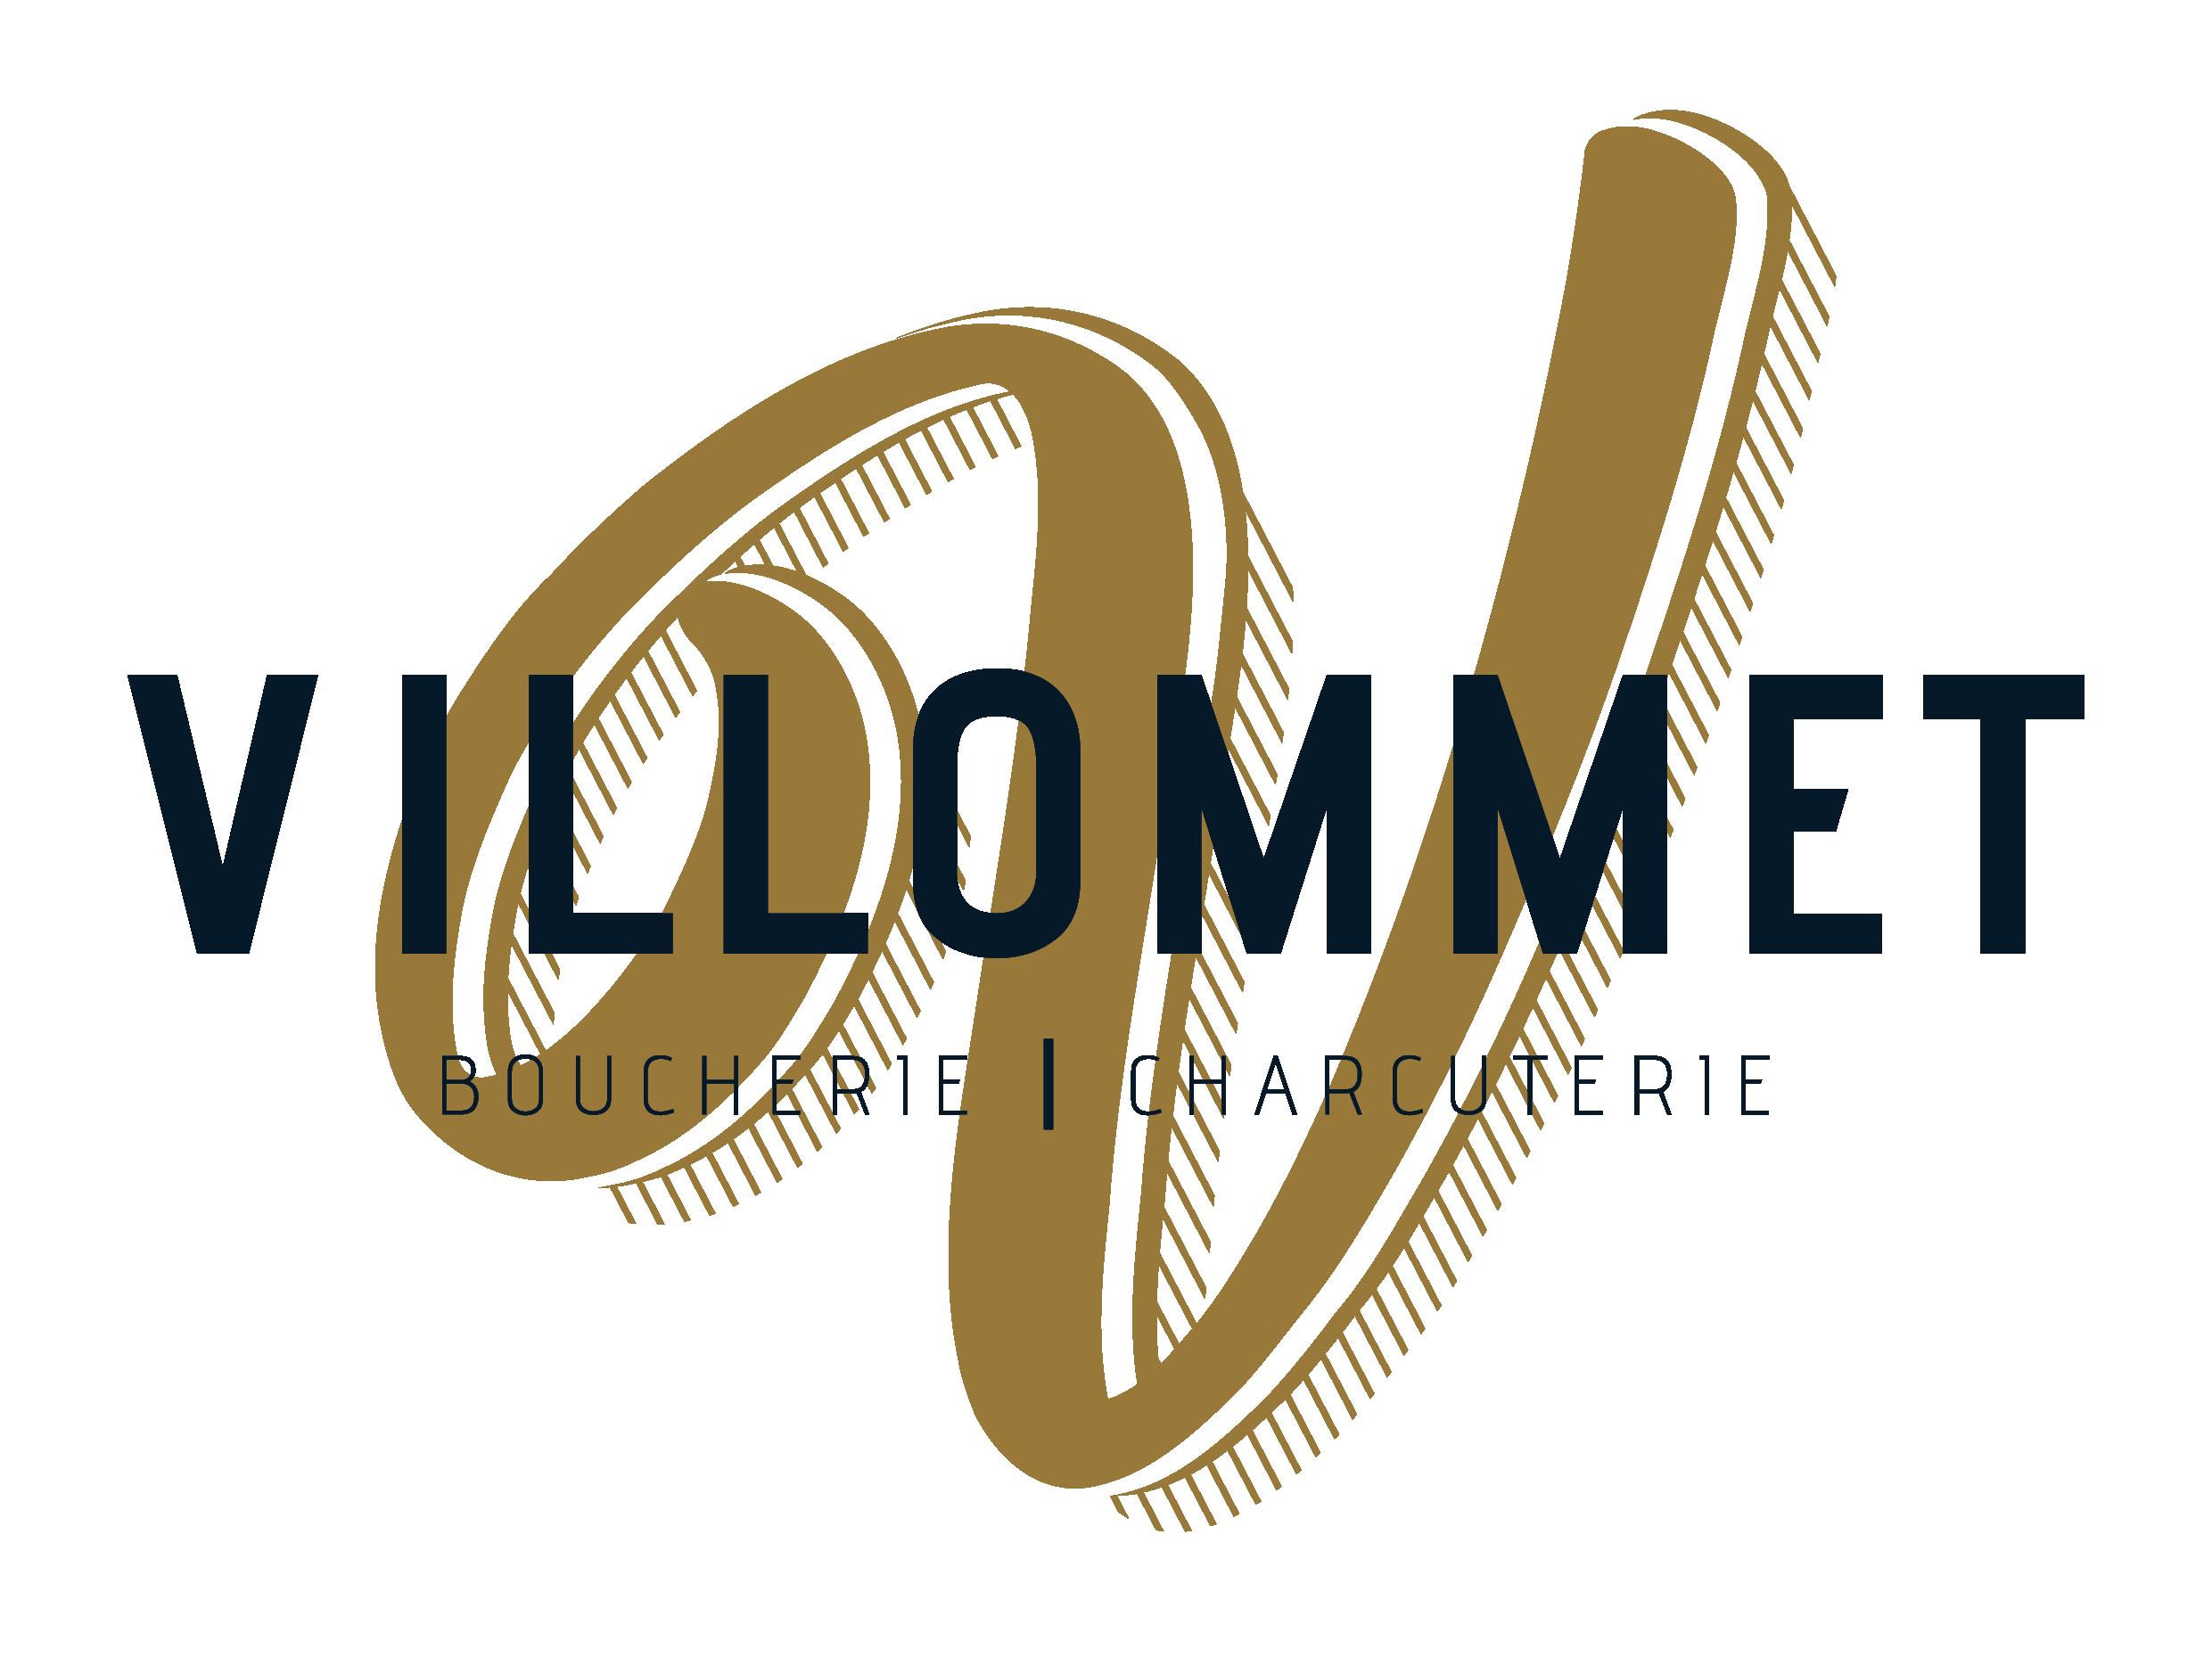 Boucherie Villommet Serge Sarl